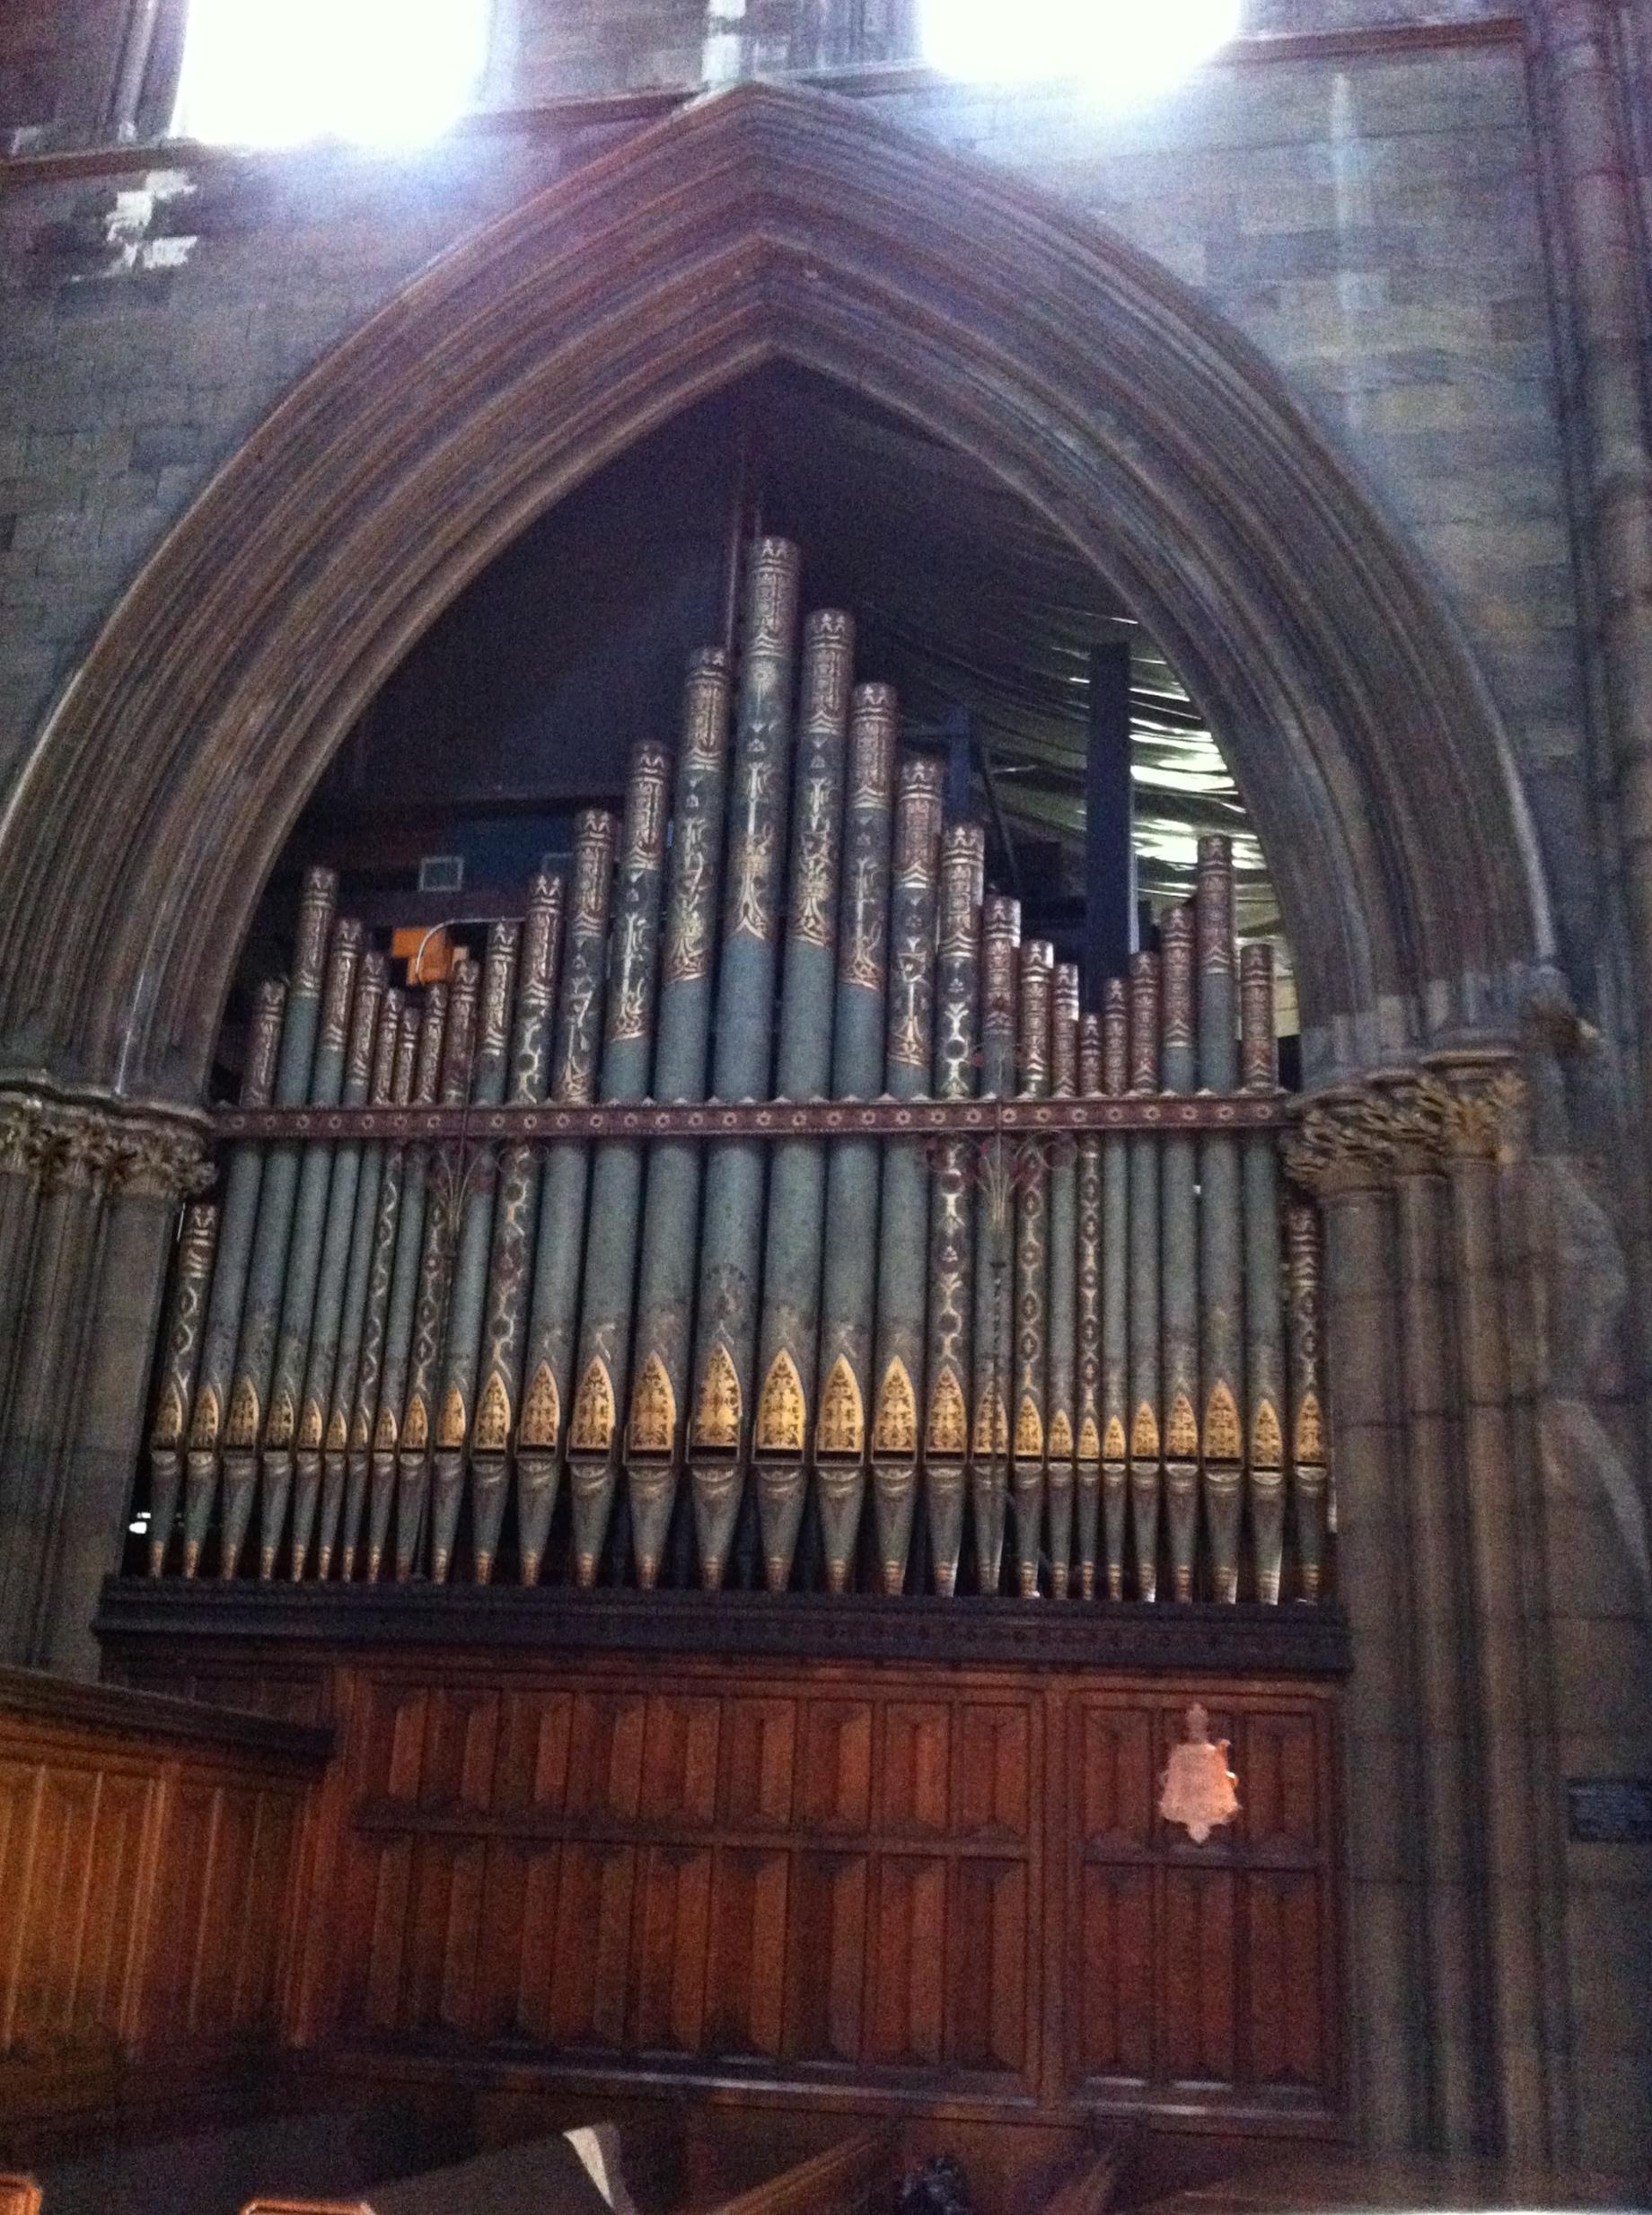 Organ pipes and screen